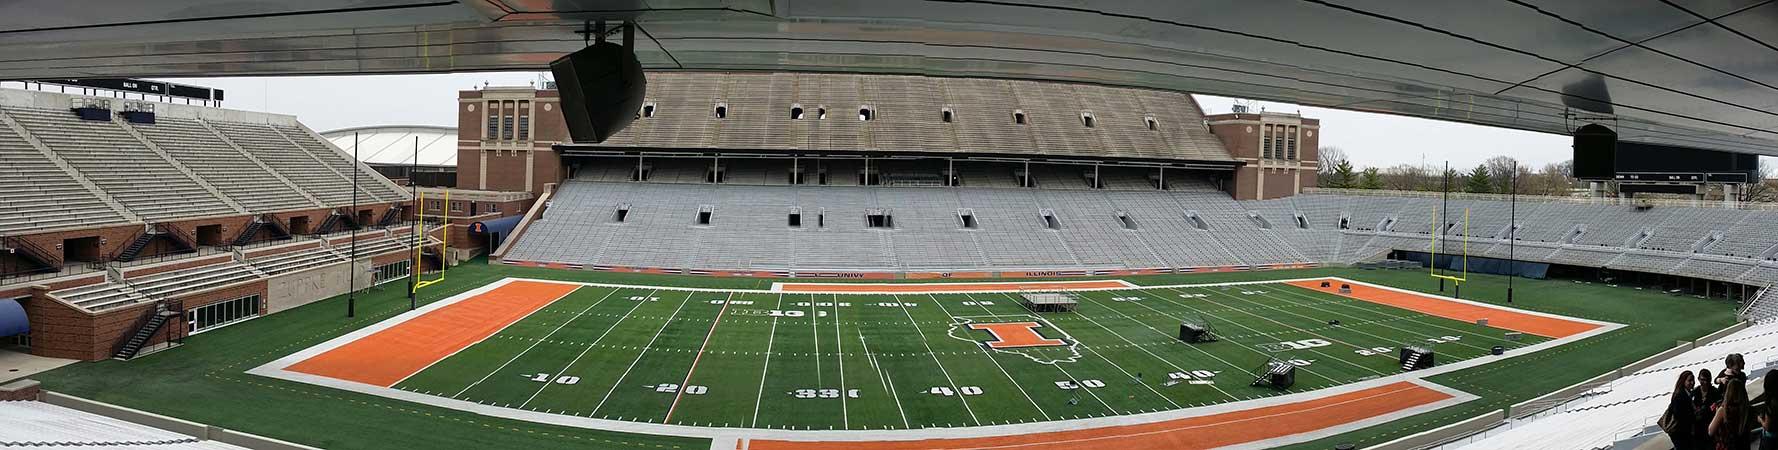 University-of-Nebraska-Huskers-@-Memorial-Stadium-Lincoln.011